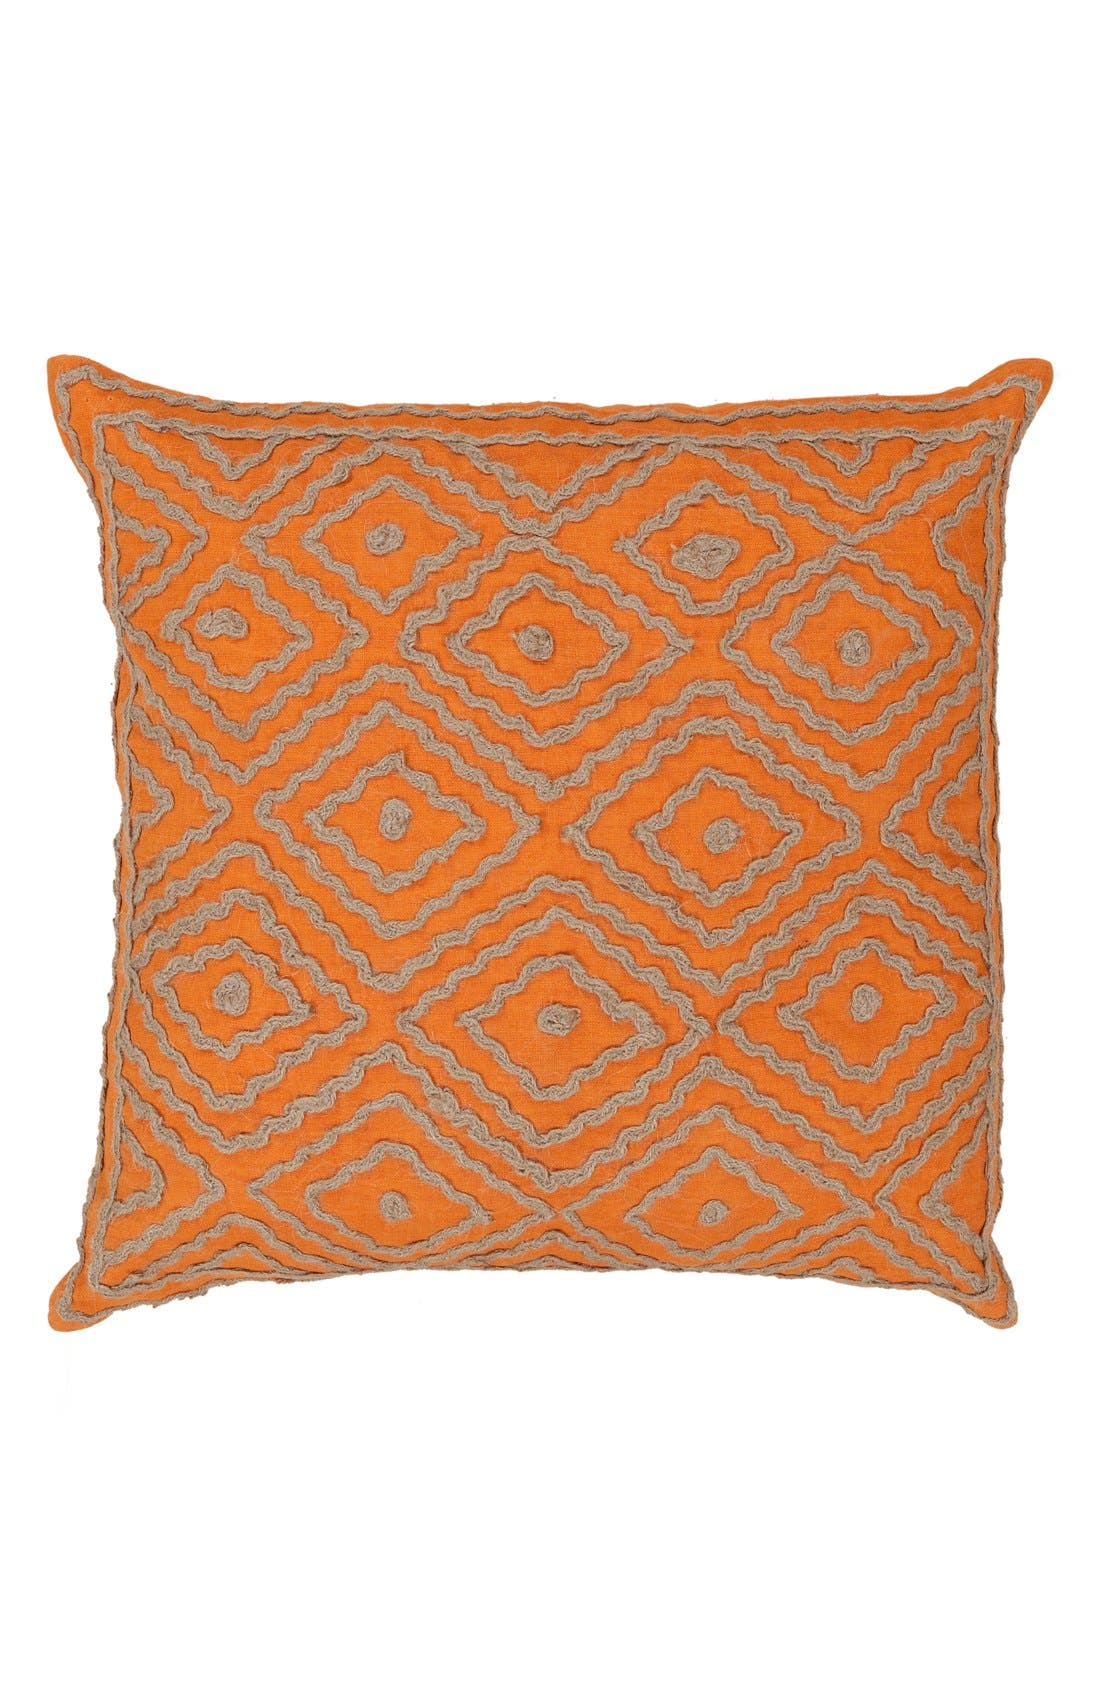 'Atlas' Pillow,                             Main thumbnail 1, color,                             Burnt Orange/ Taupe